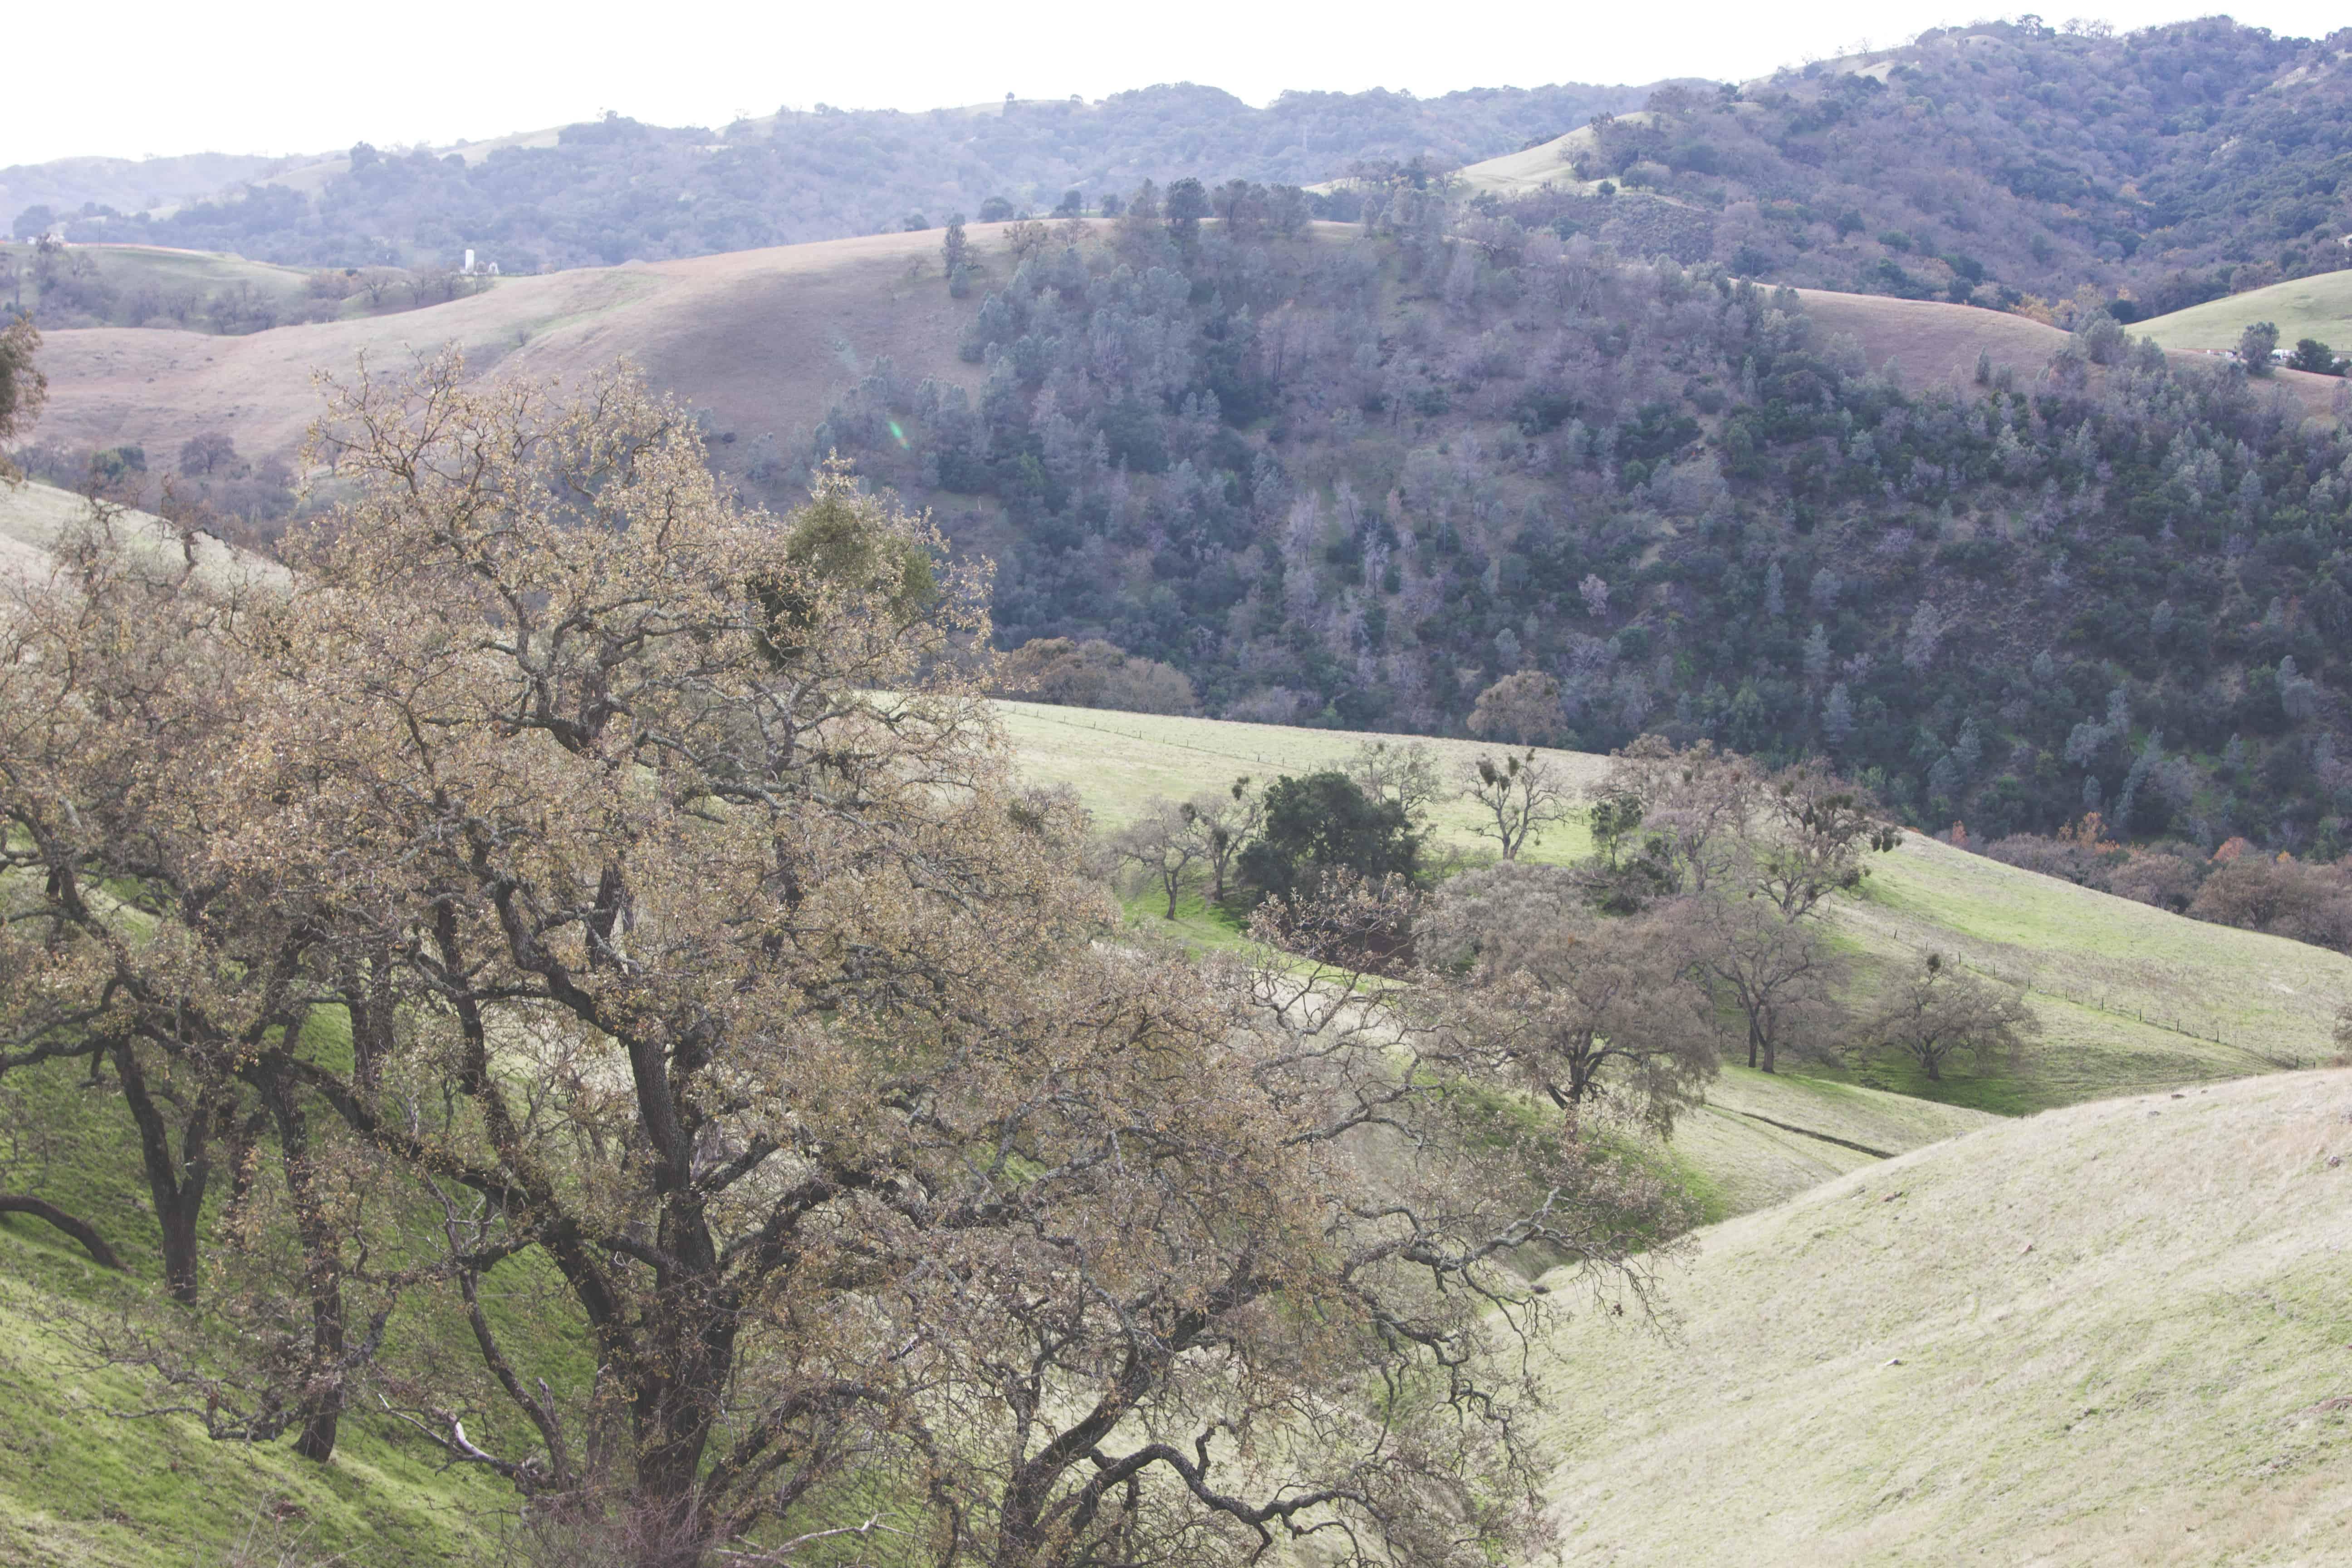 Sunol Regional Wilderness Park near the Bay Area in California